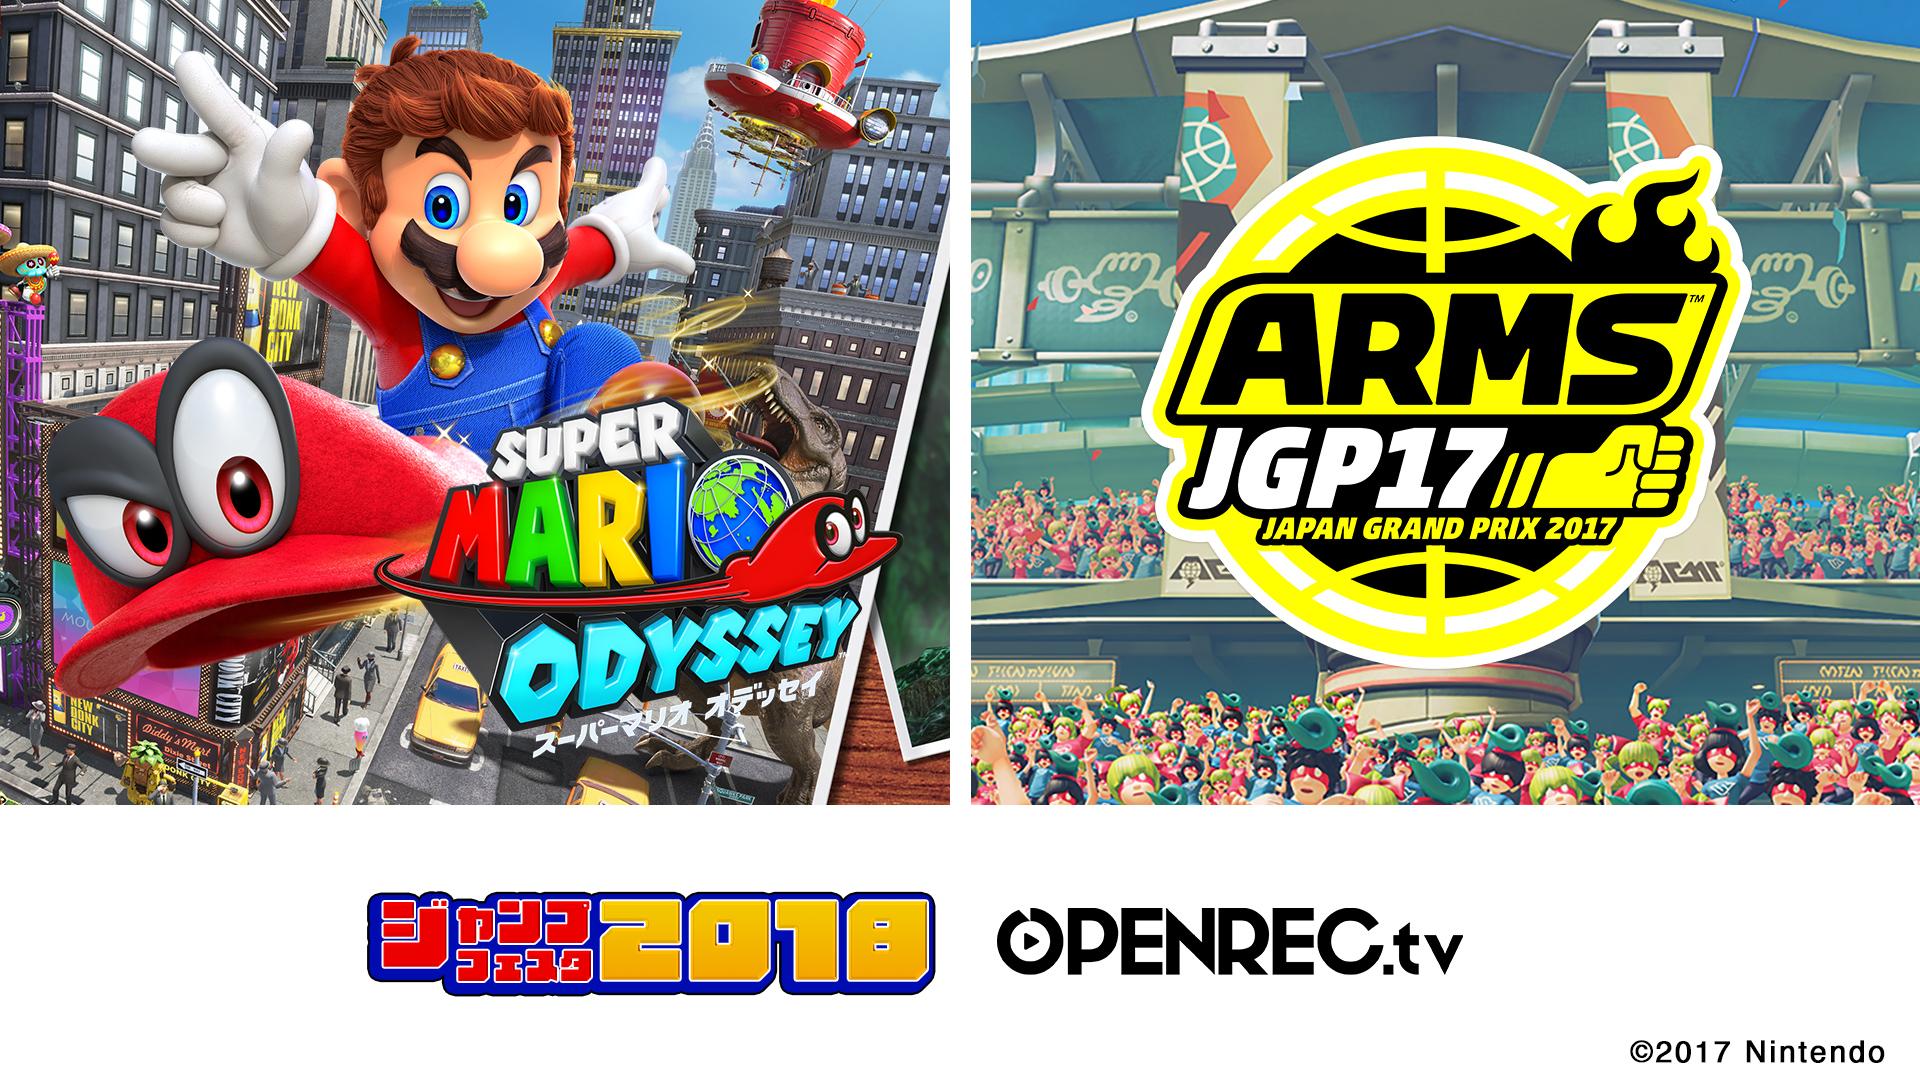 OPENREC.tvにて、『ジャンプフェスタ2018』任天堂ブースにて開催される『スーパーマリオ オデッセイ 特別ステージ』『ARMS JAPAN GRAND PRIX 2017』の模様を12月16日より2日間配信決定! ~ジャンプ作品でおなじみの人気声優が勢揃い!~